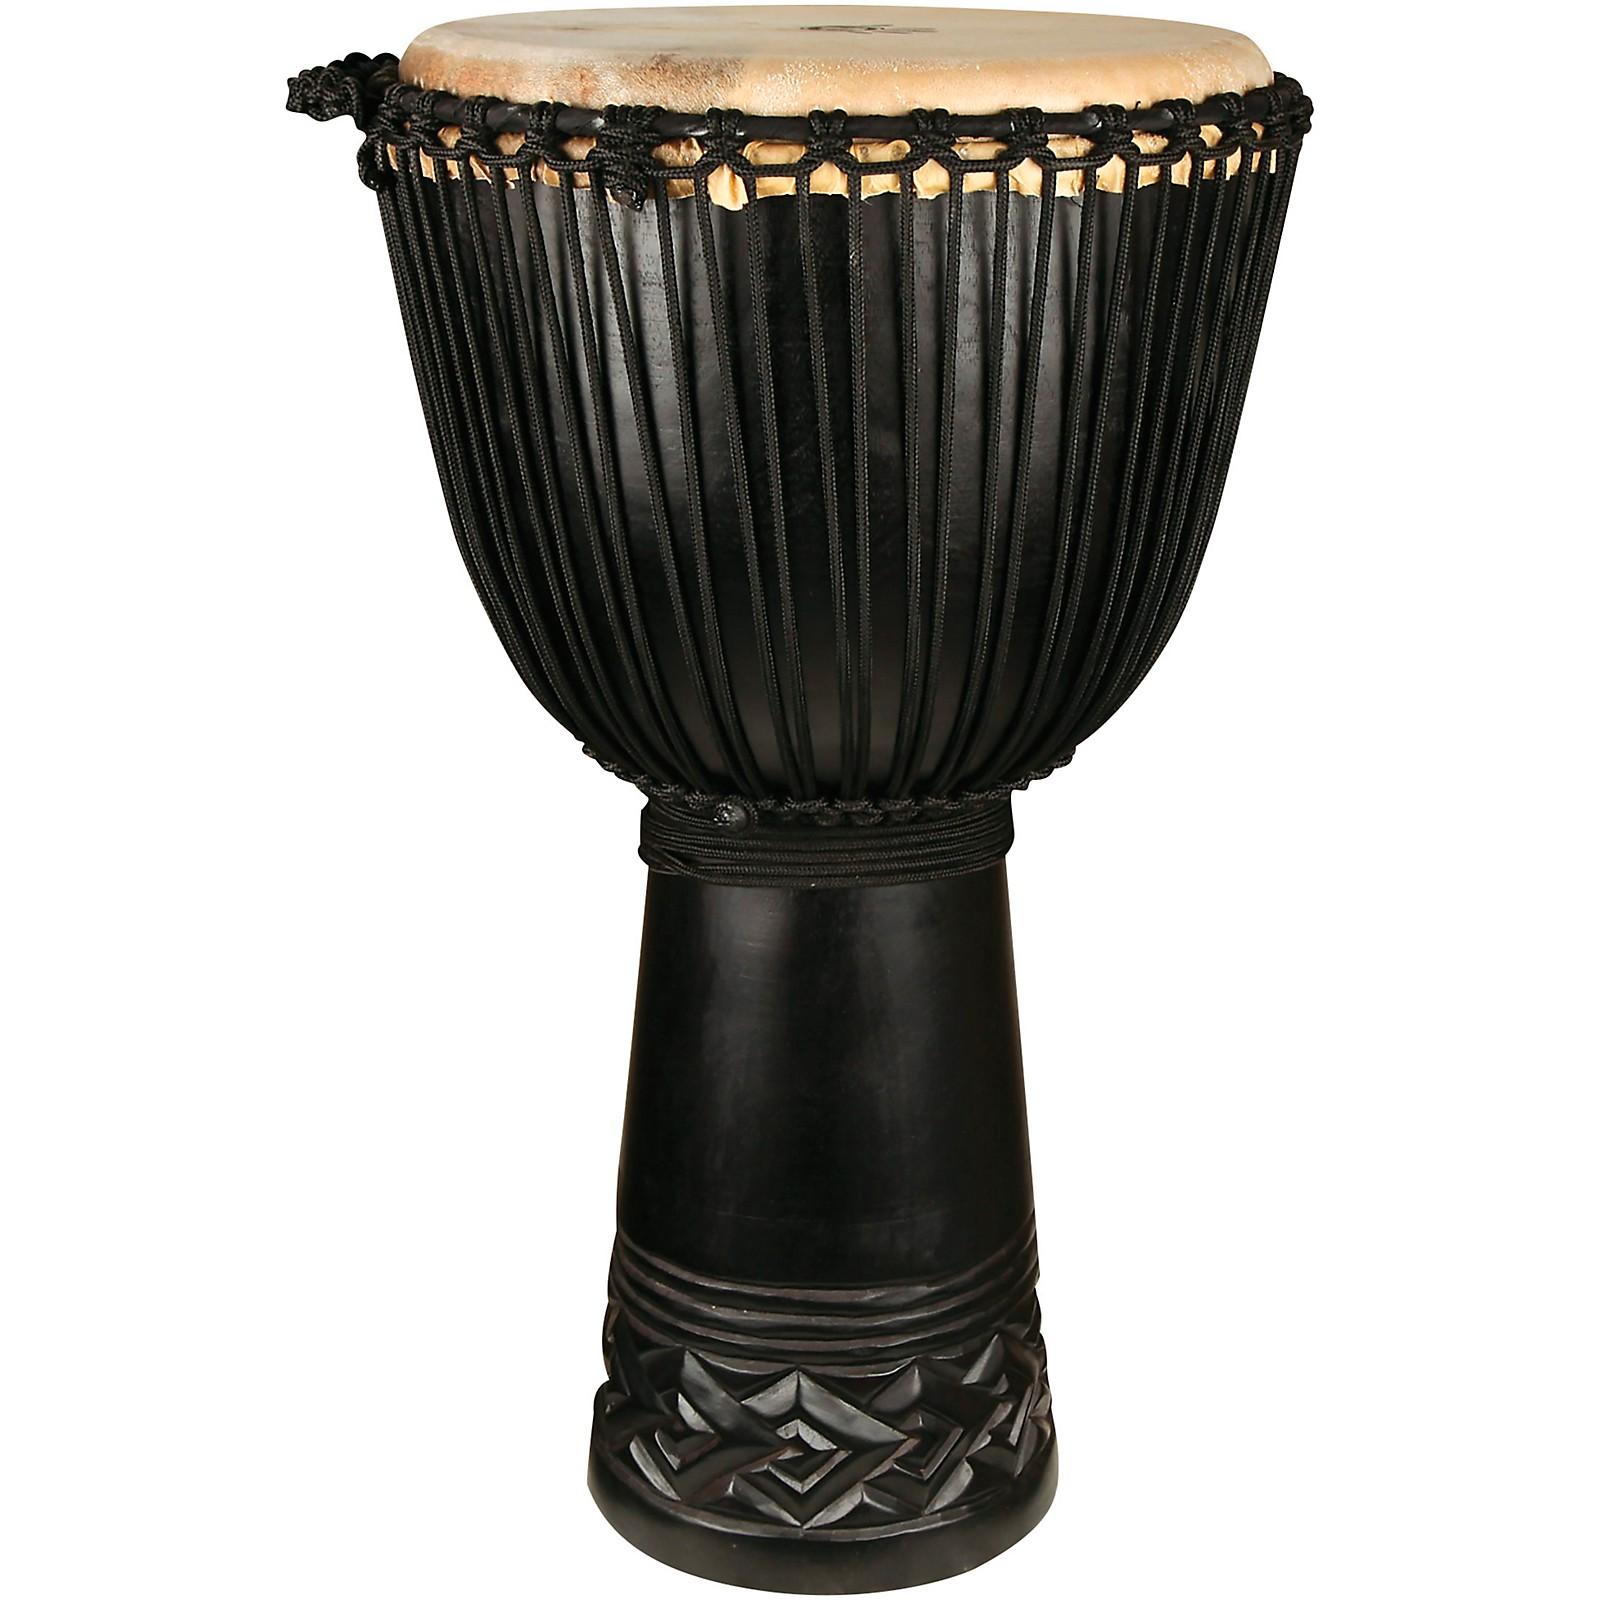 X8 Drums Stallion Pro Djembe